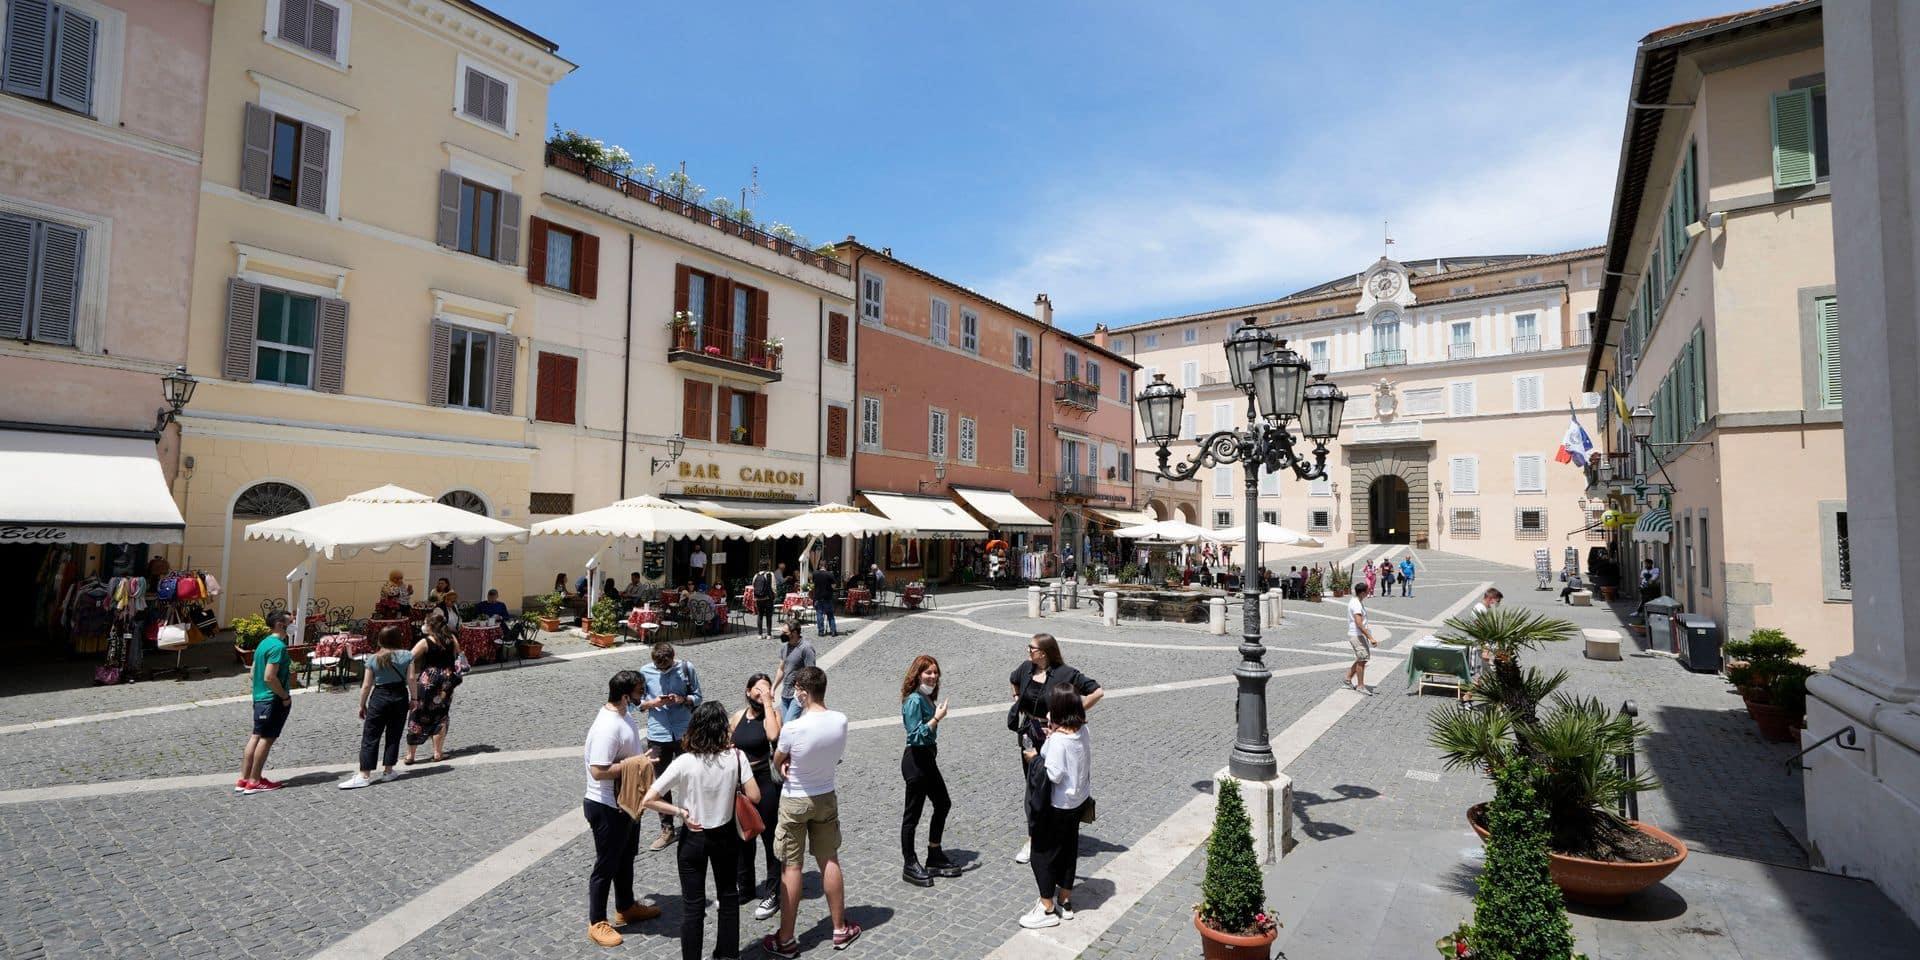 Coronavirus: le nombre de contaminations continue à augmenter en Italie